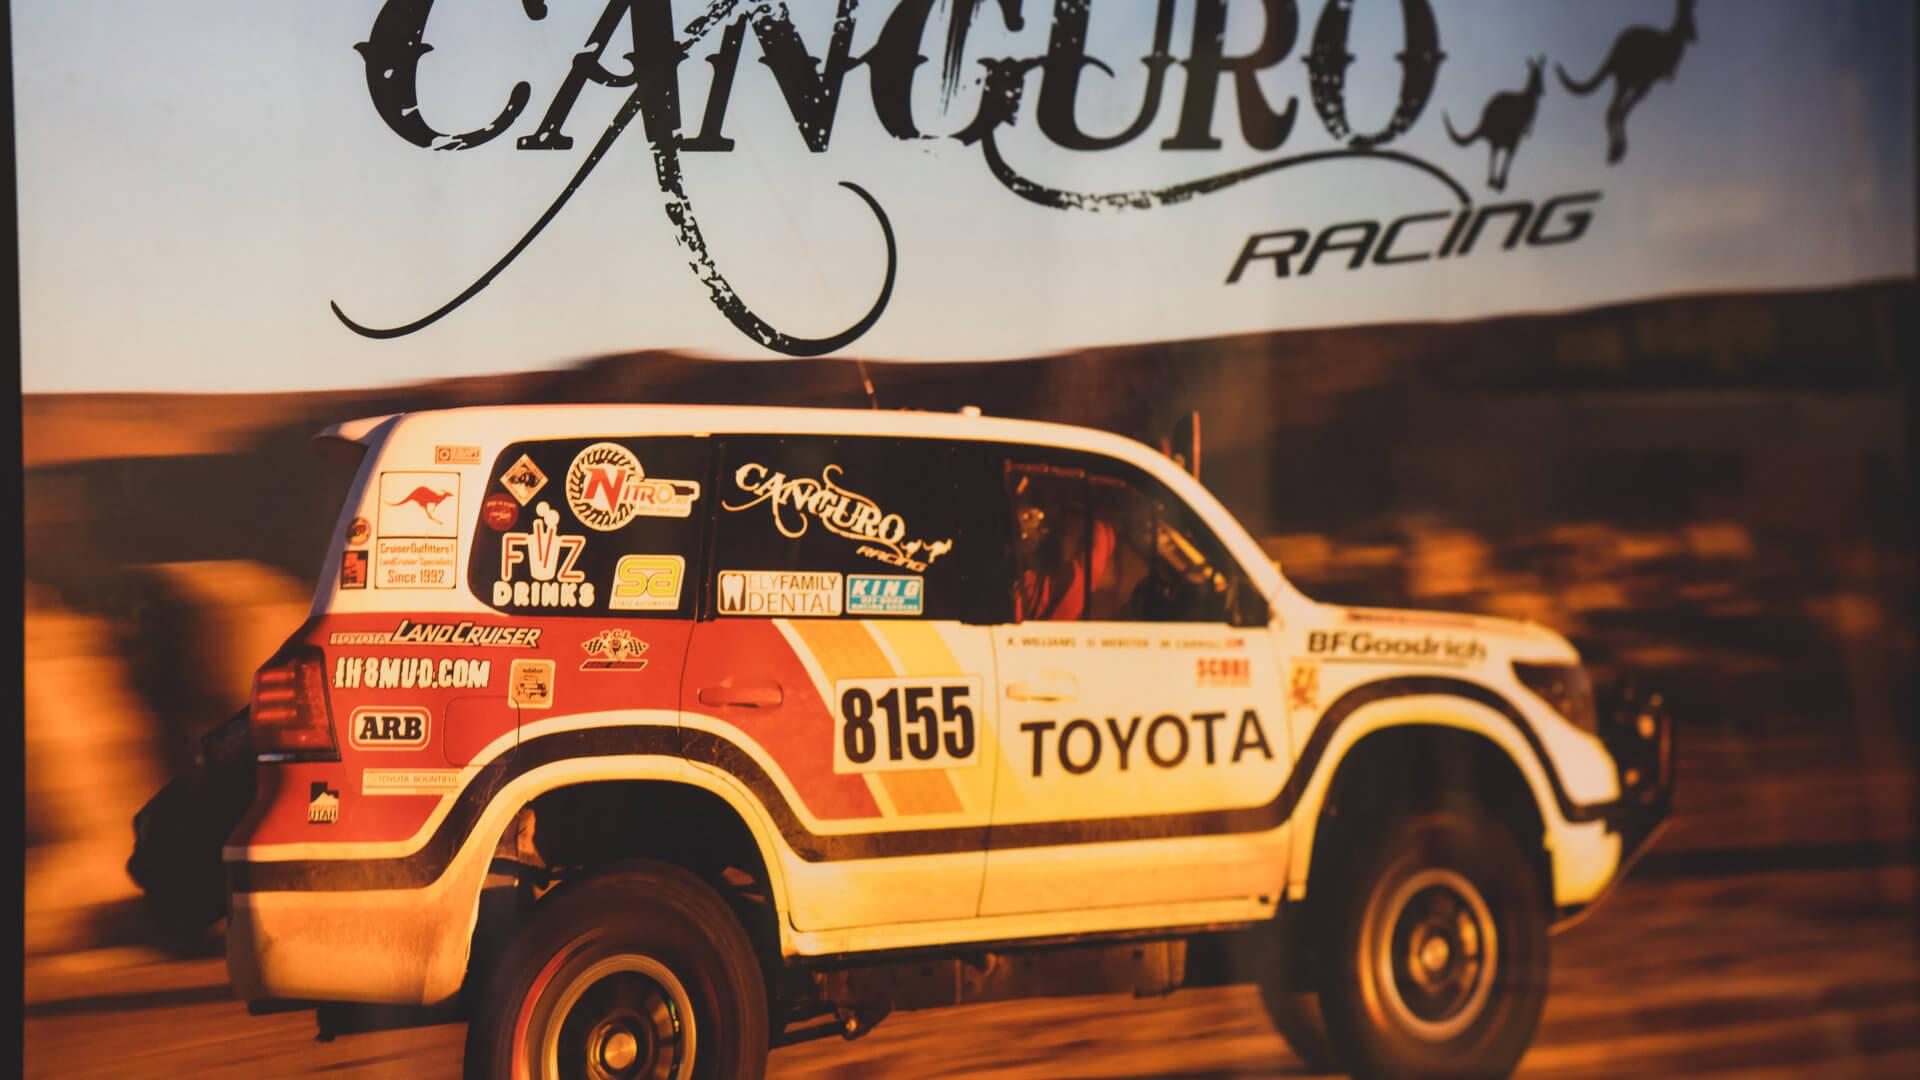 Canguro Racing vehicle